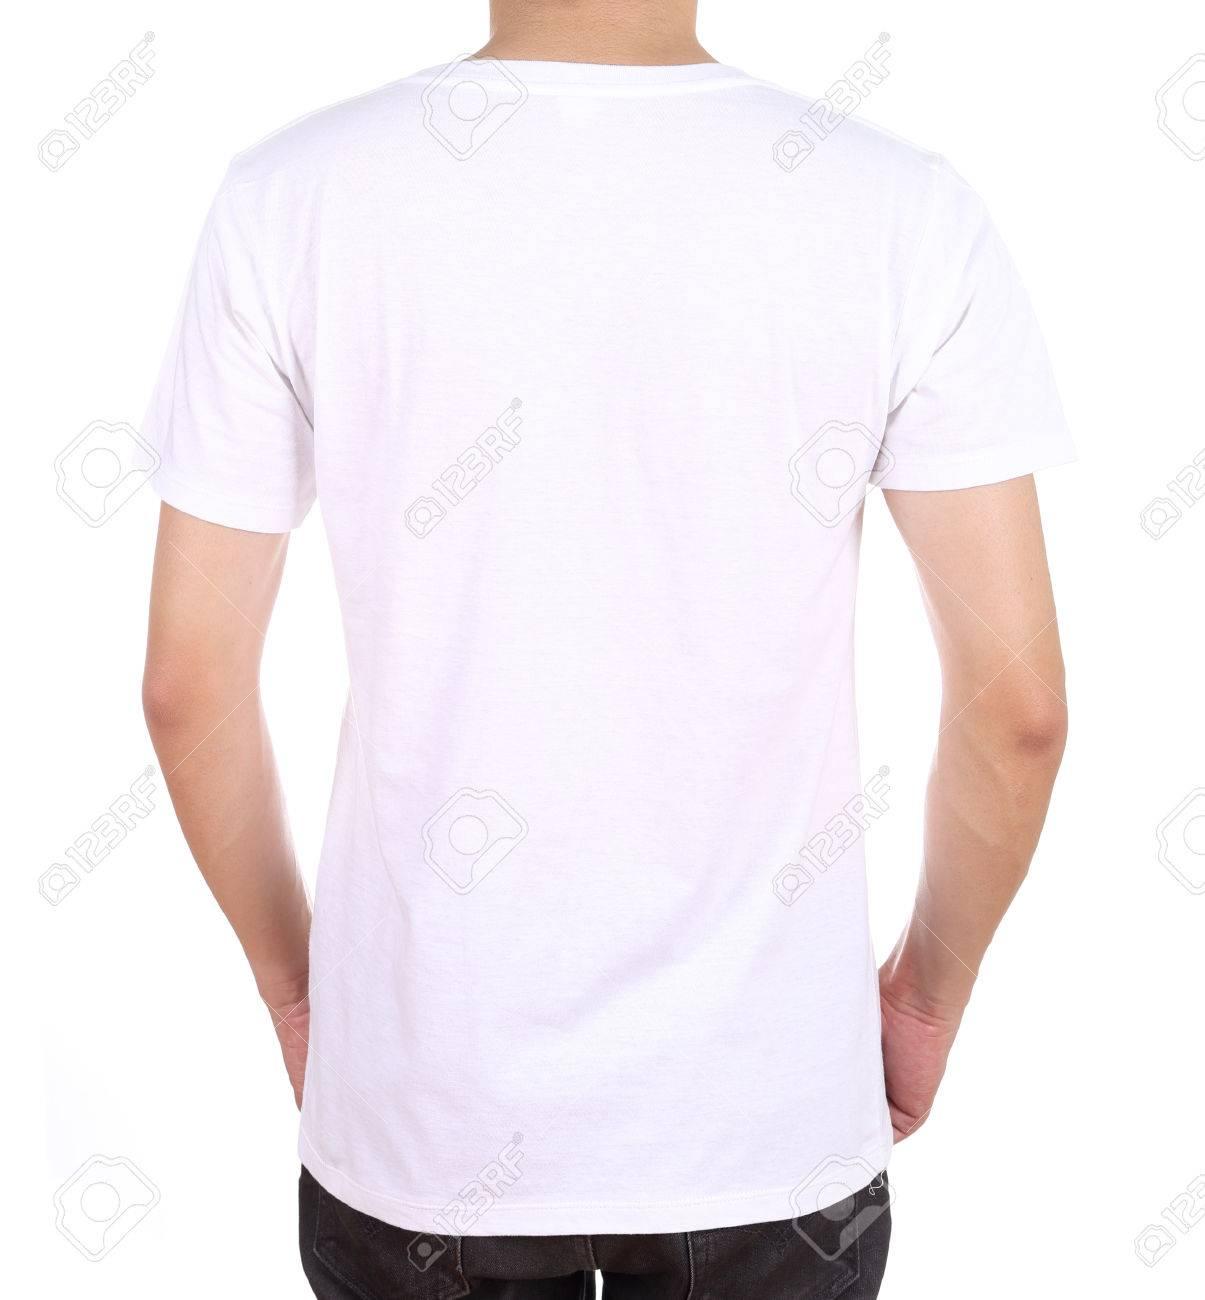 blank white t shirt